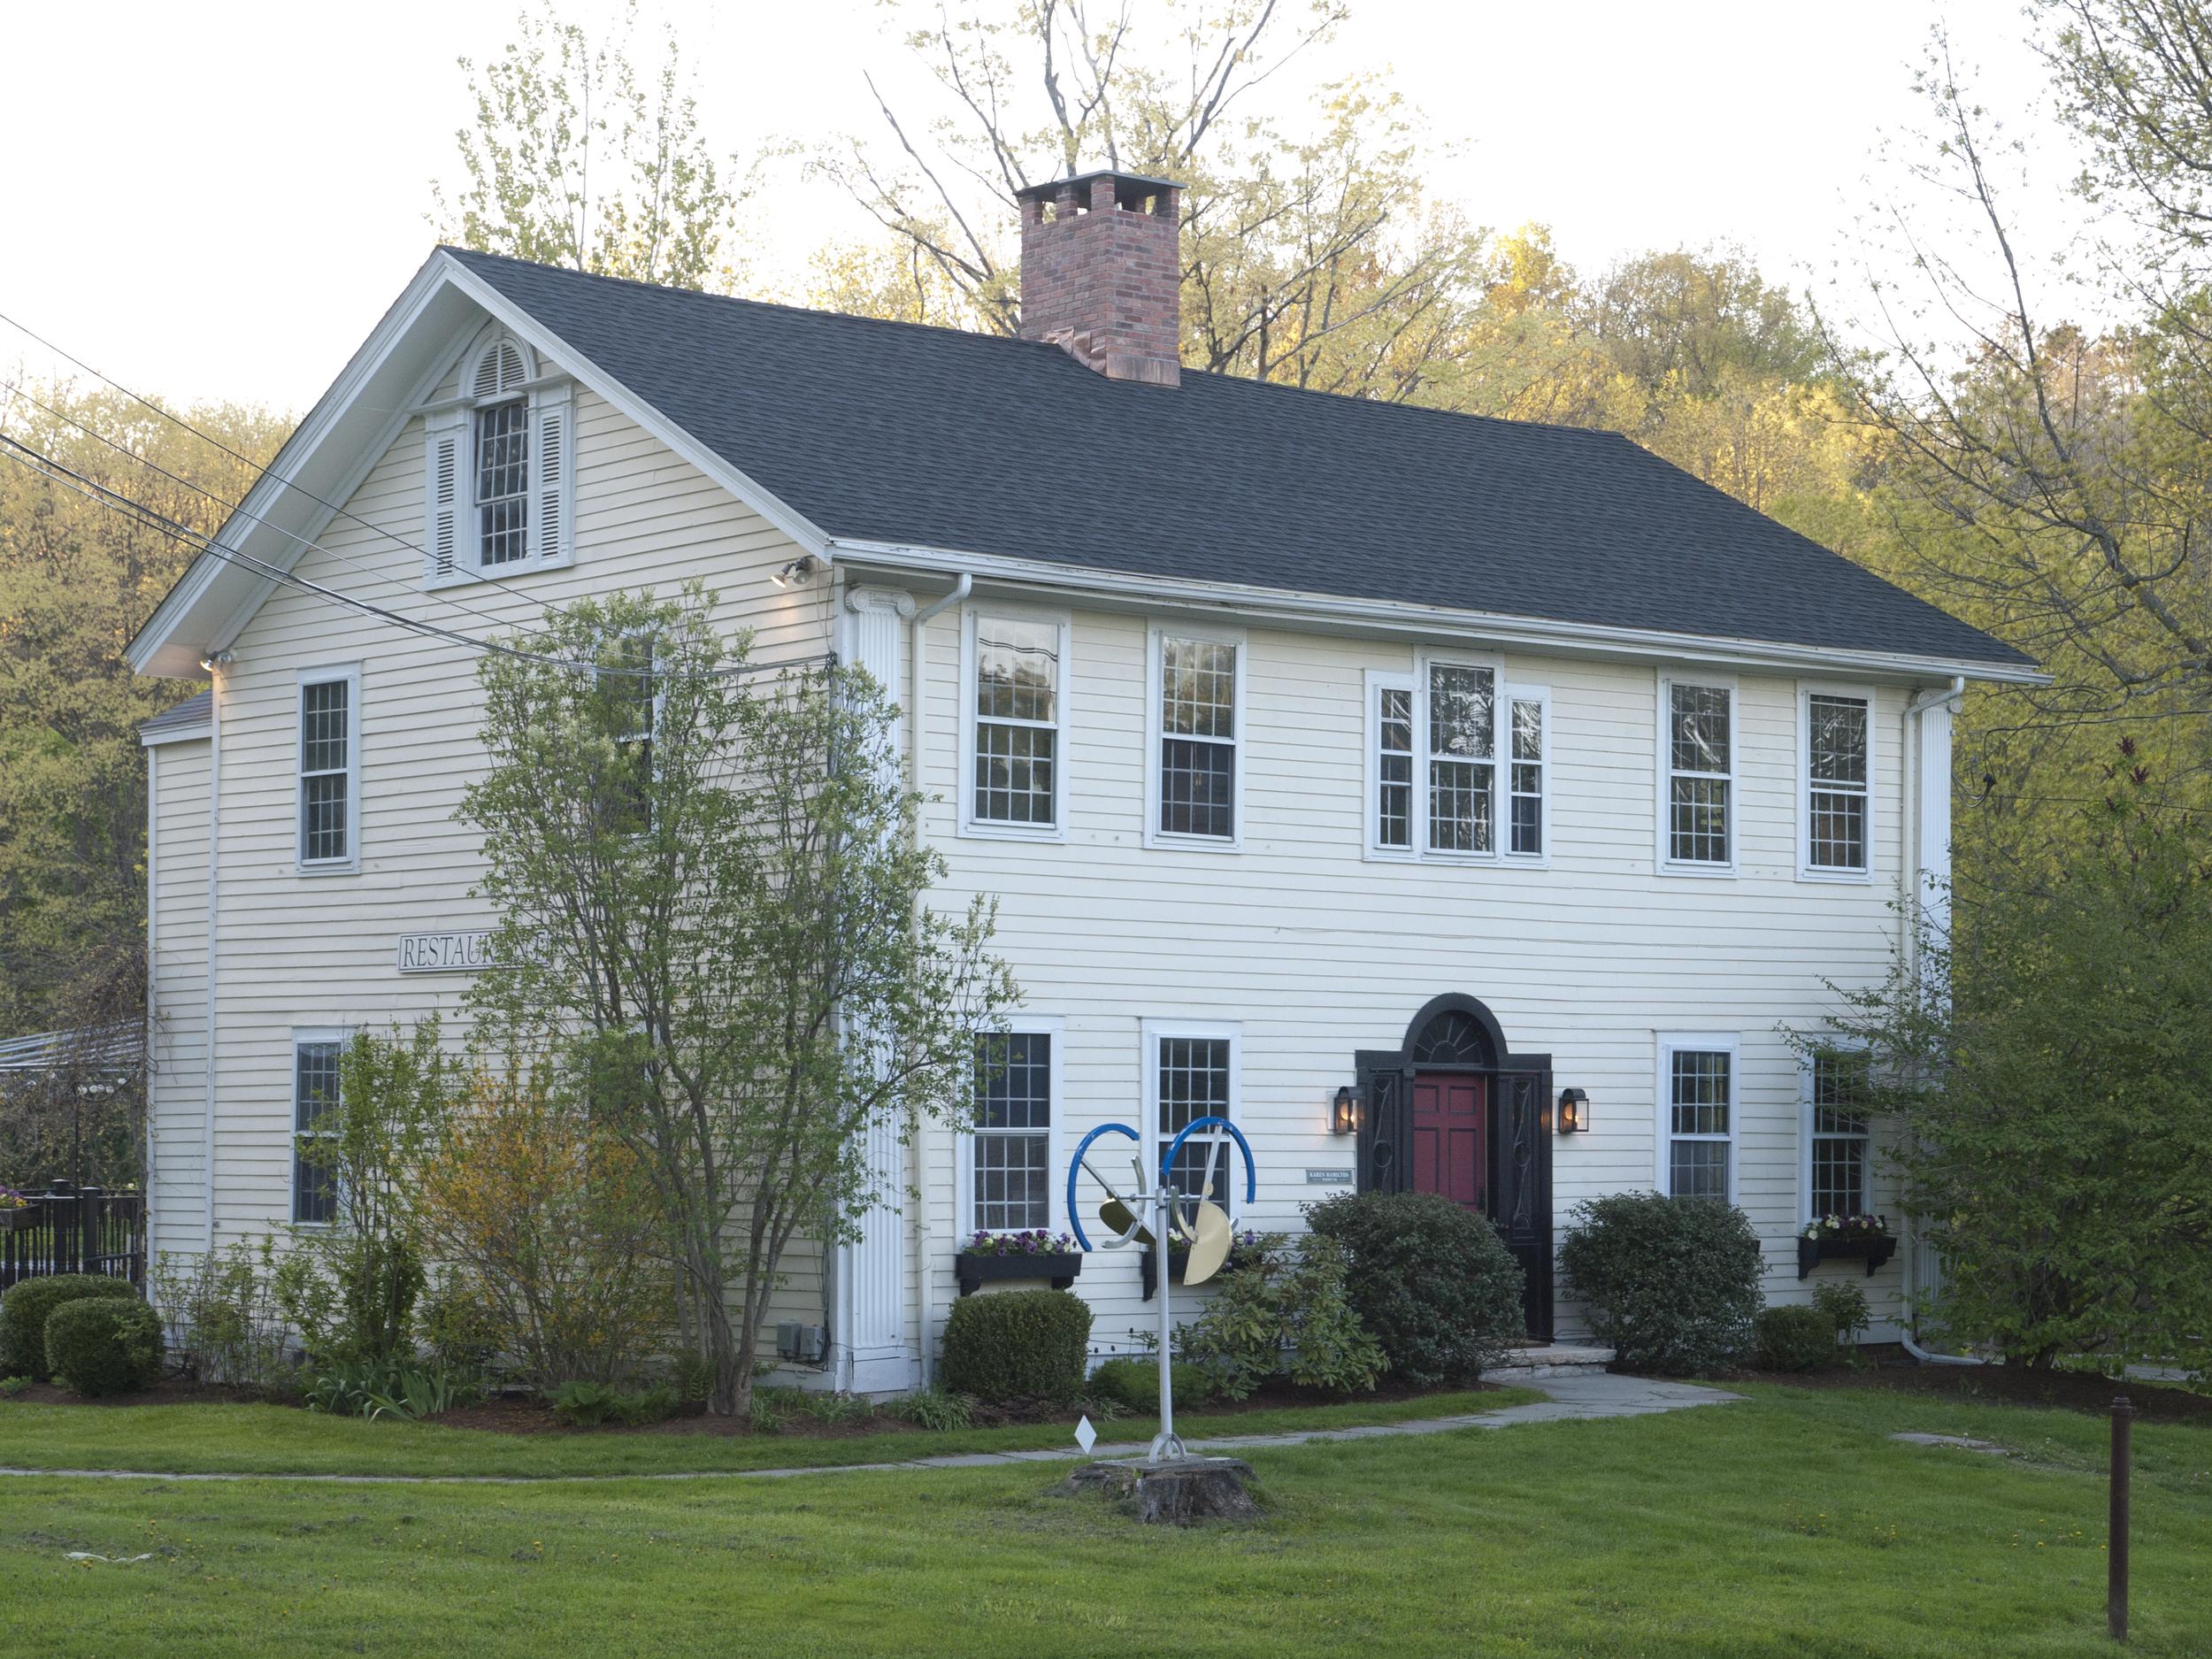 Lord-Haas House